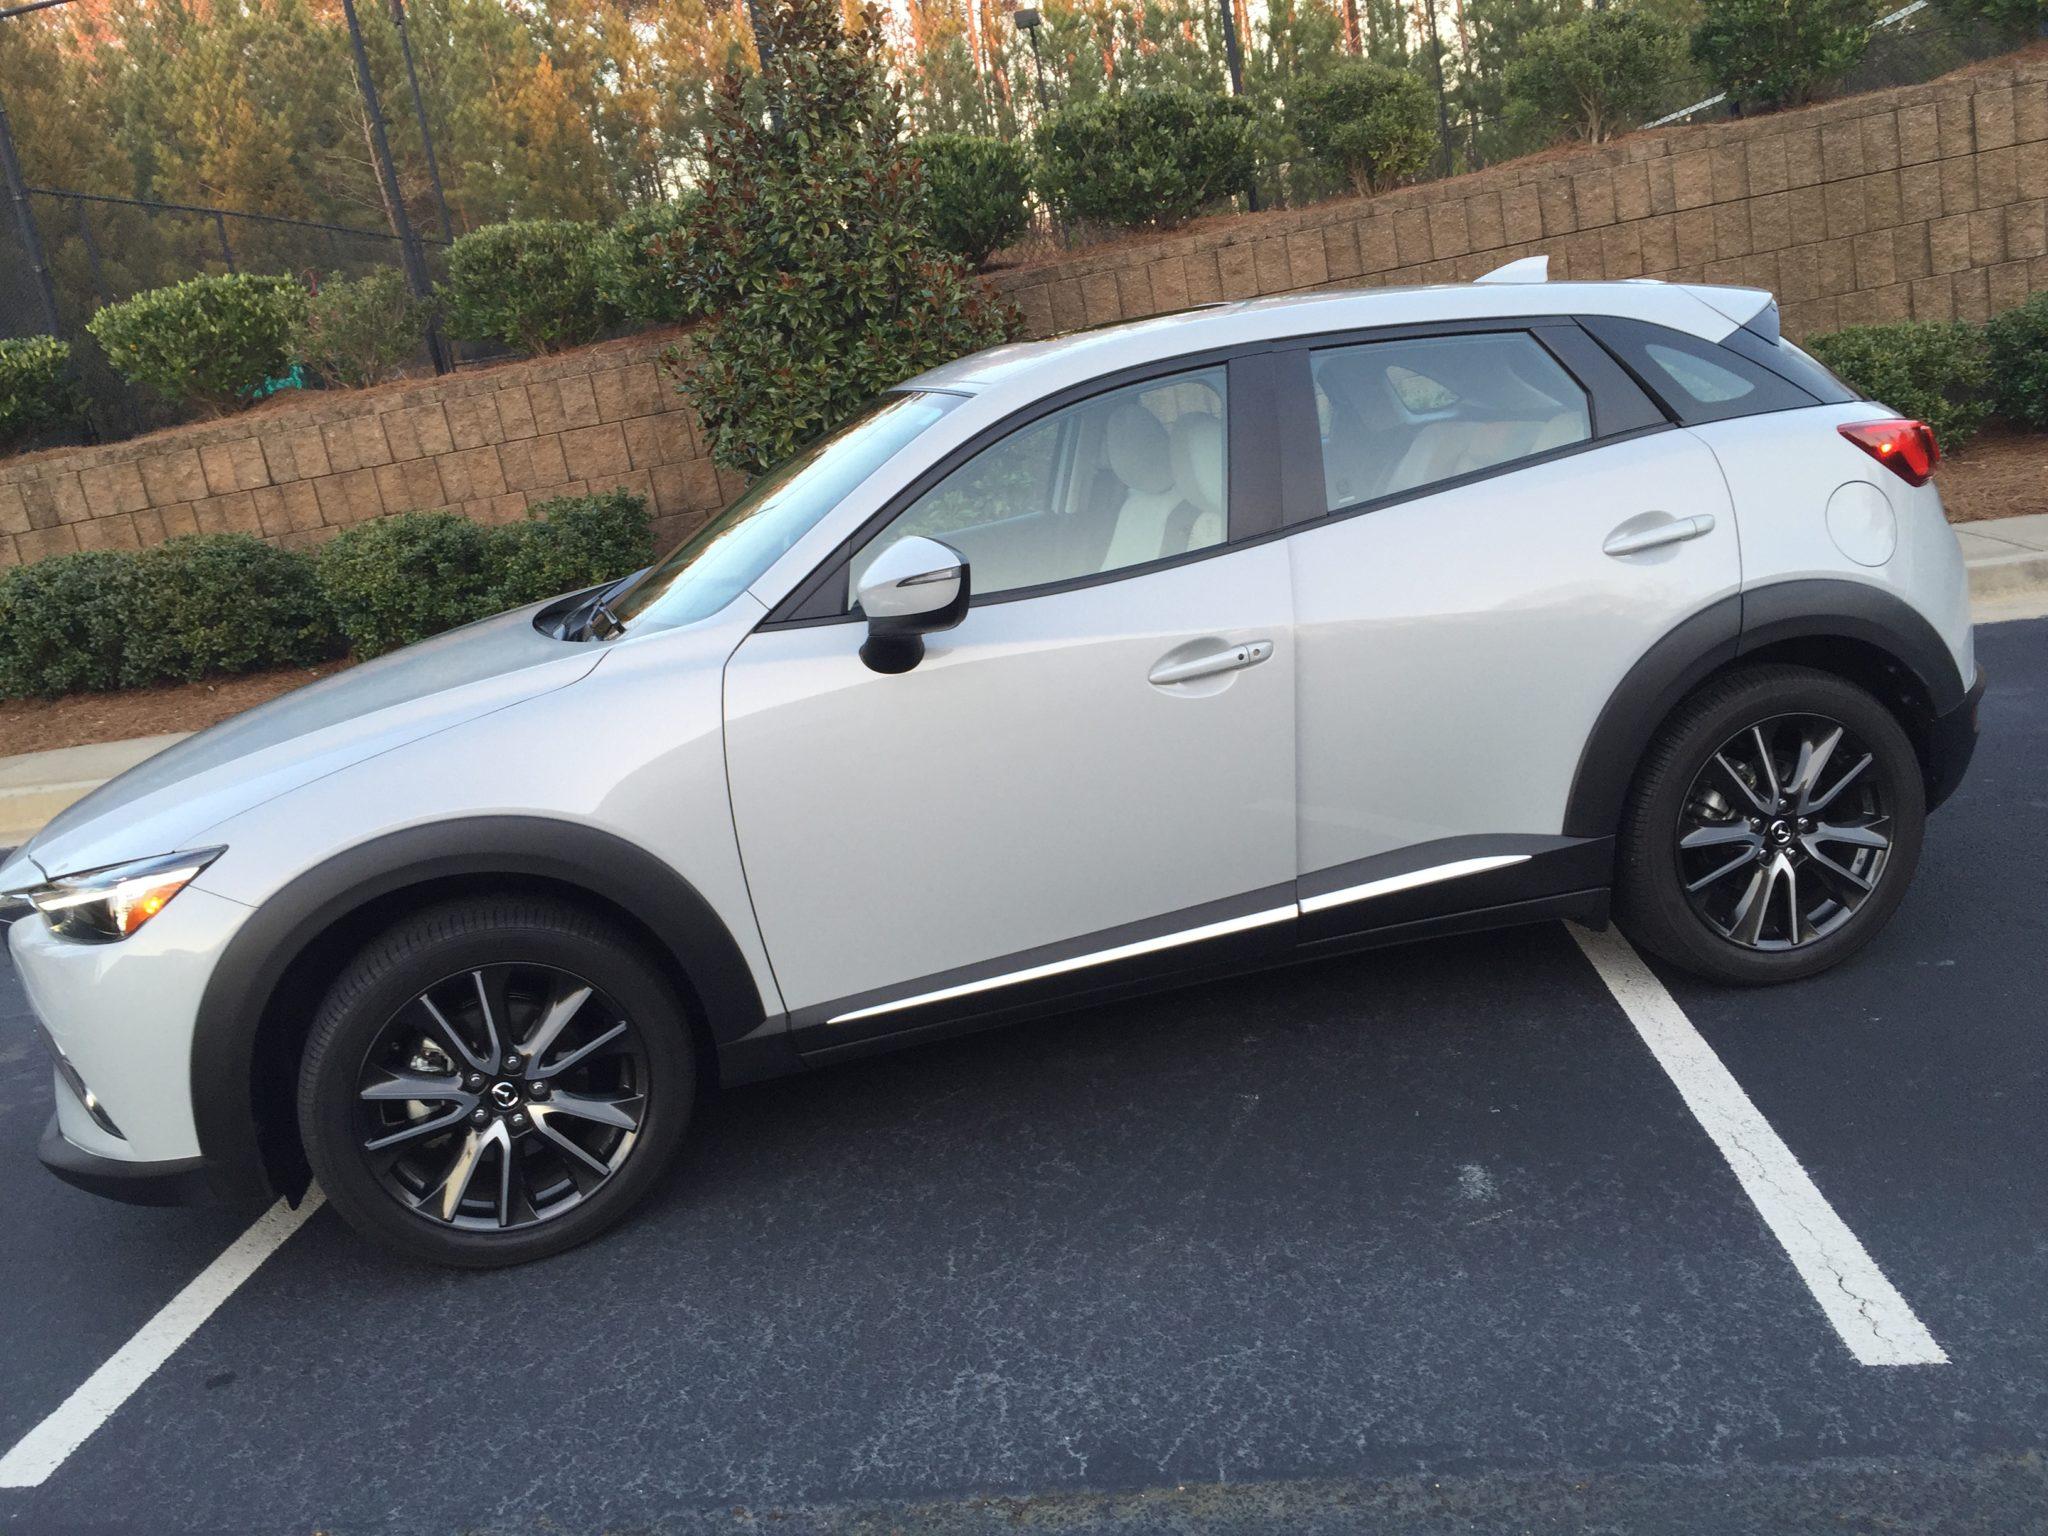 My Kinda Car! The 2016 Mazda CX-3